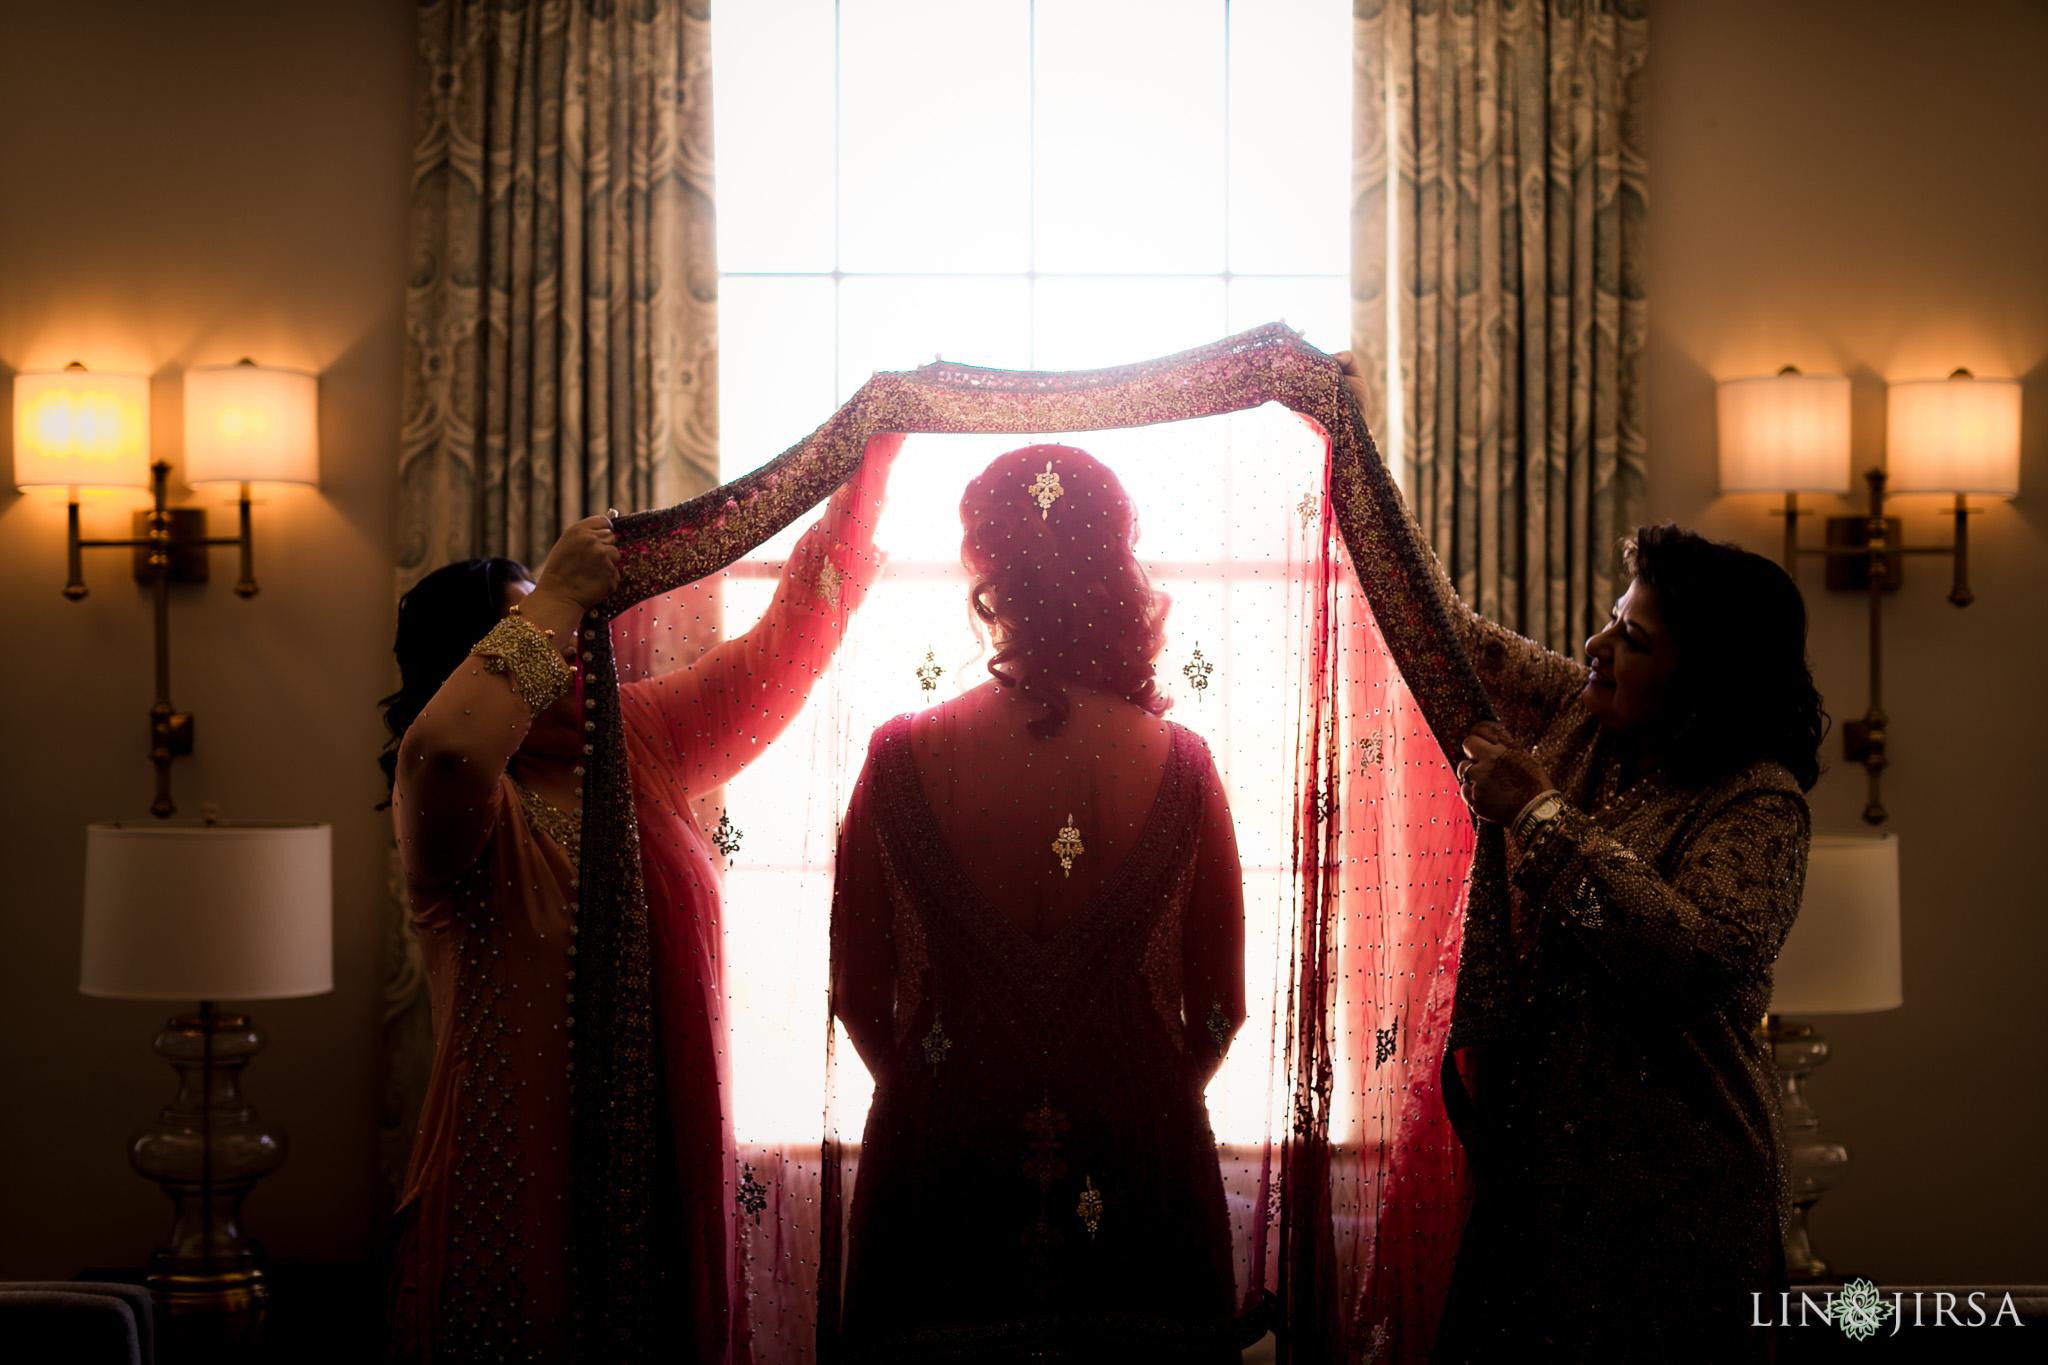 03 altadena town country club pakistani bride wedding photography